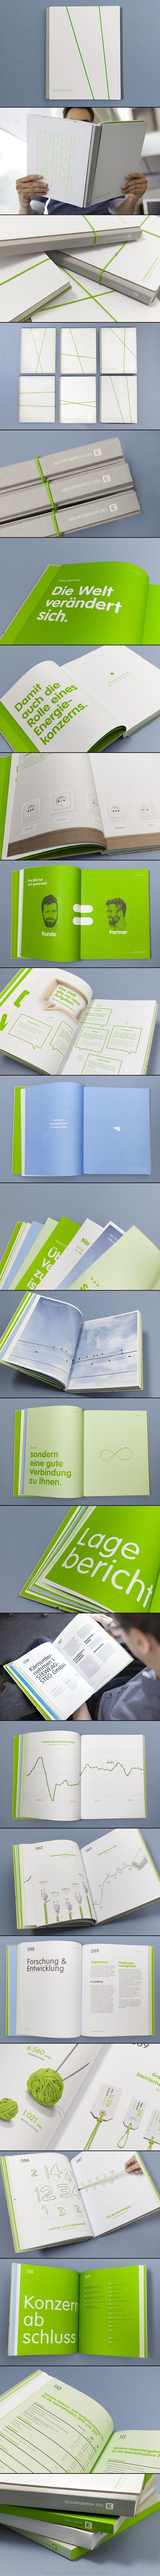 Steiermark Annual Report | by Moodley Brand Identity